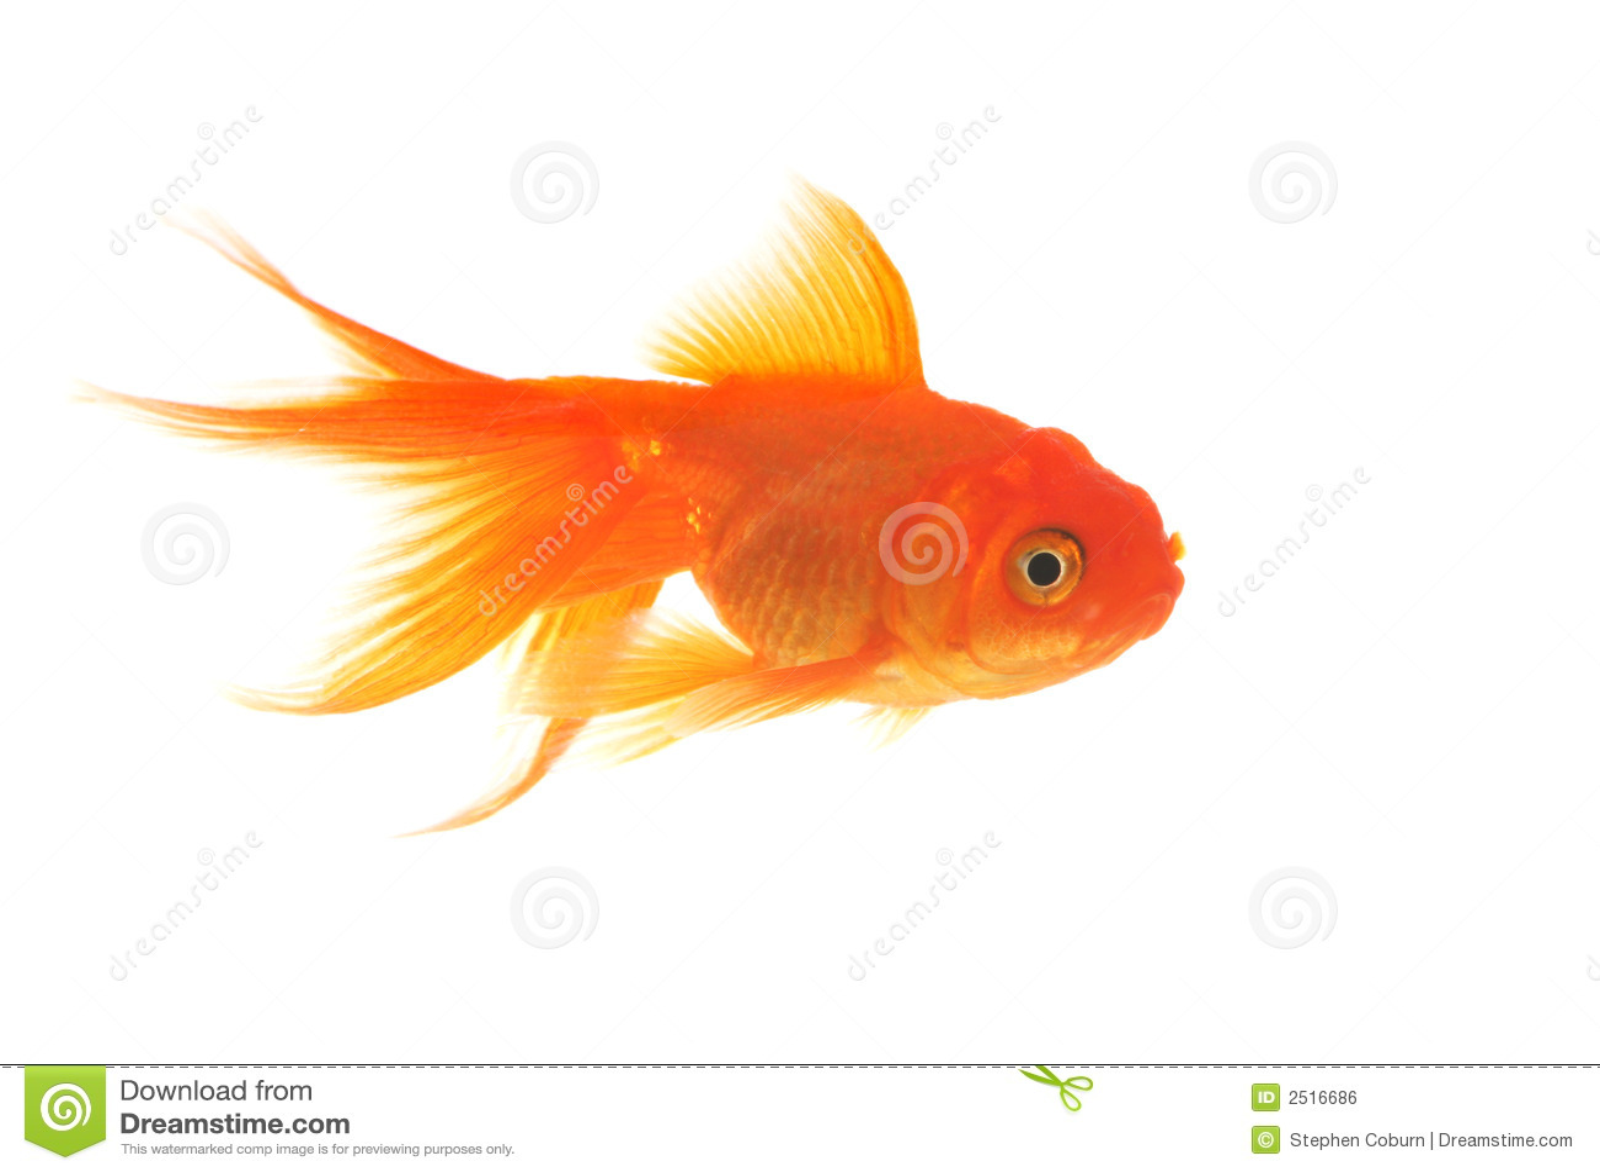 how to raise big goldfish